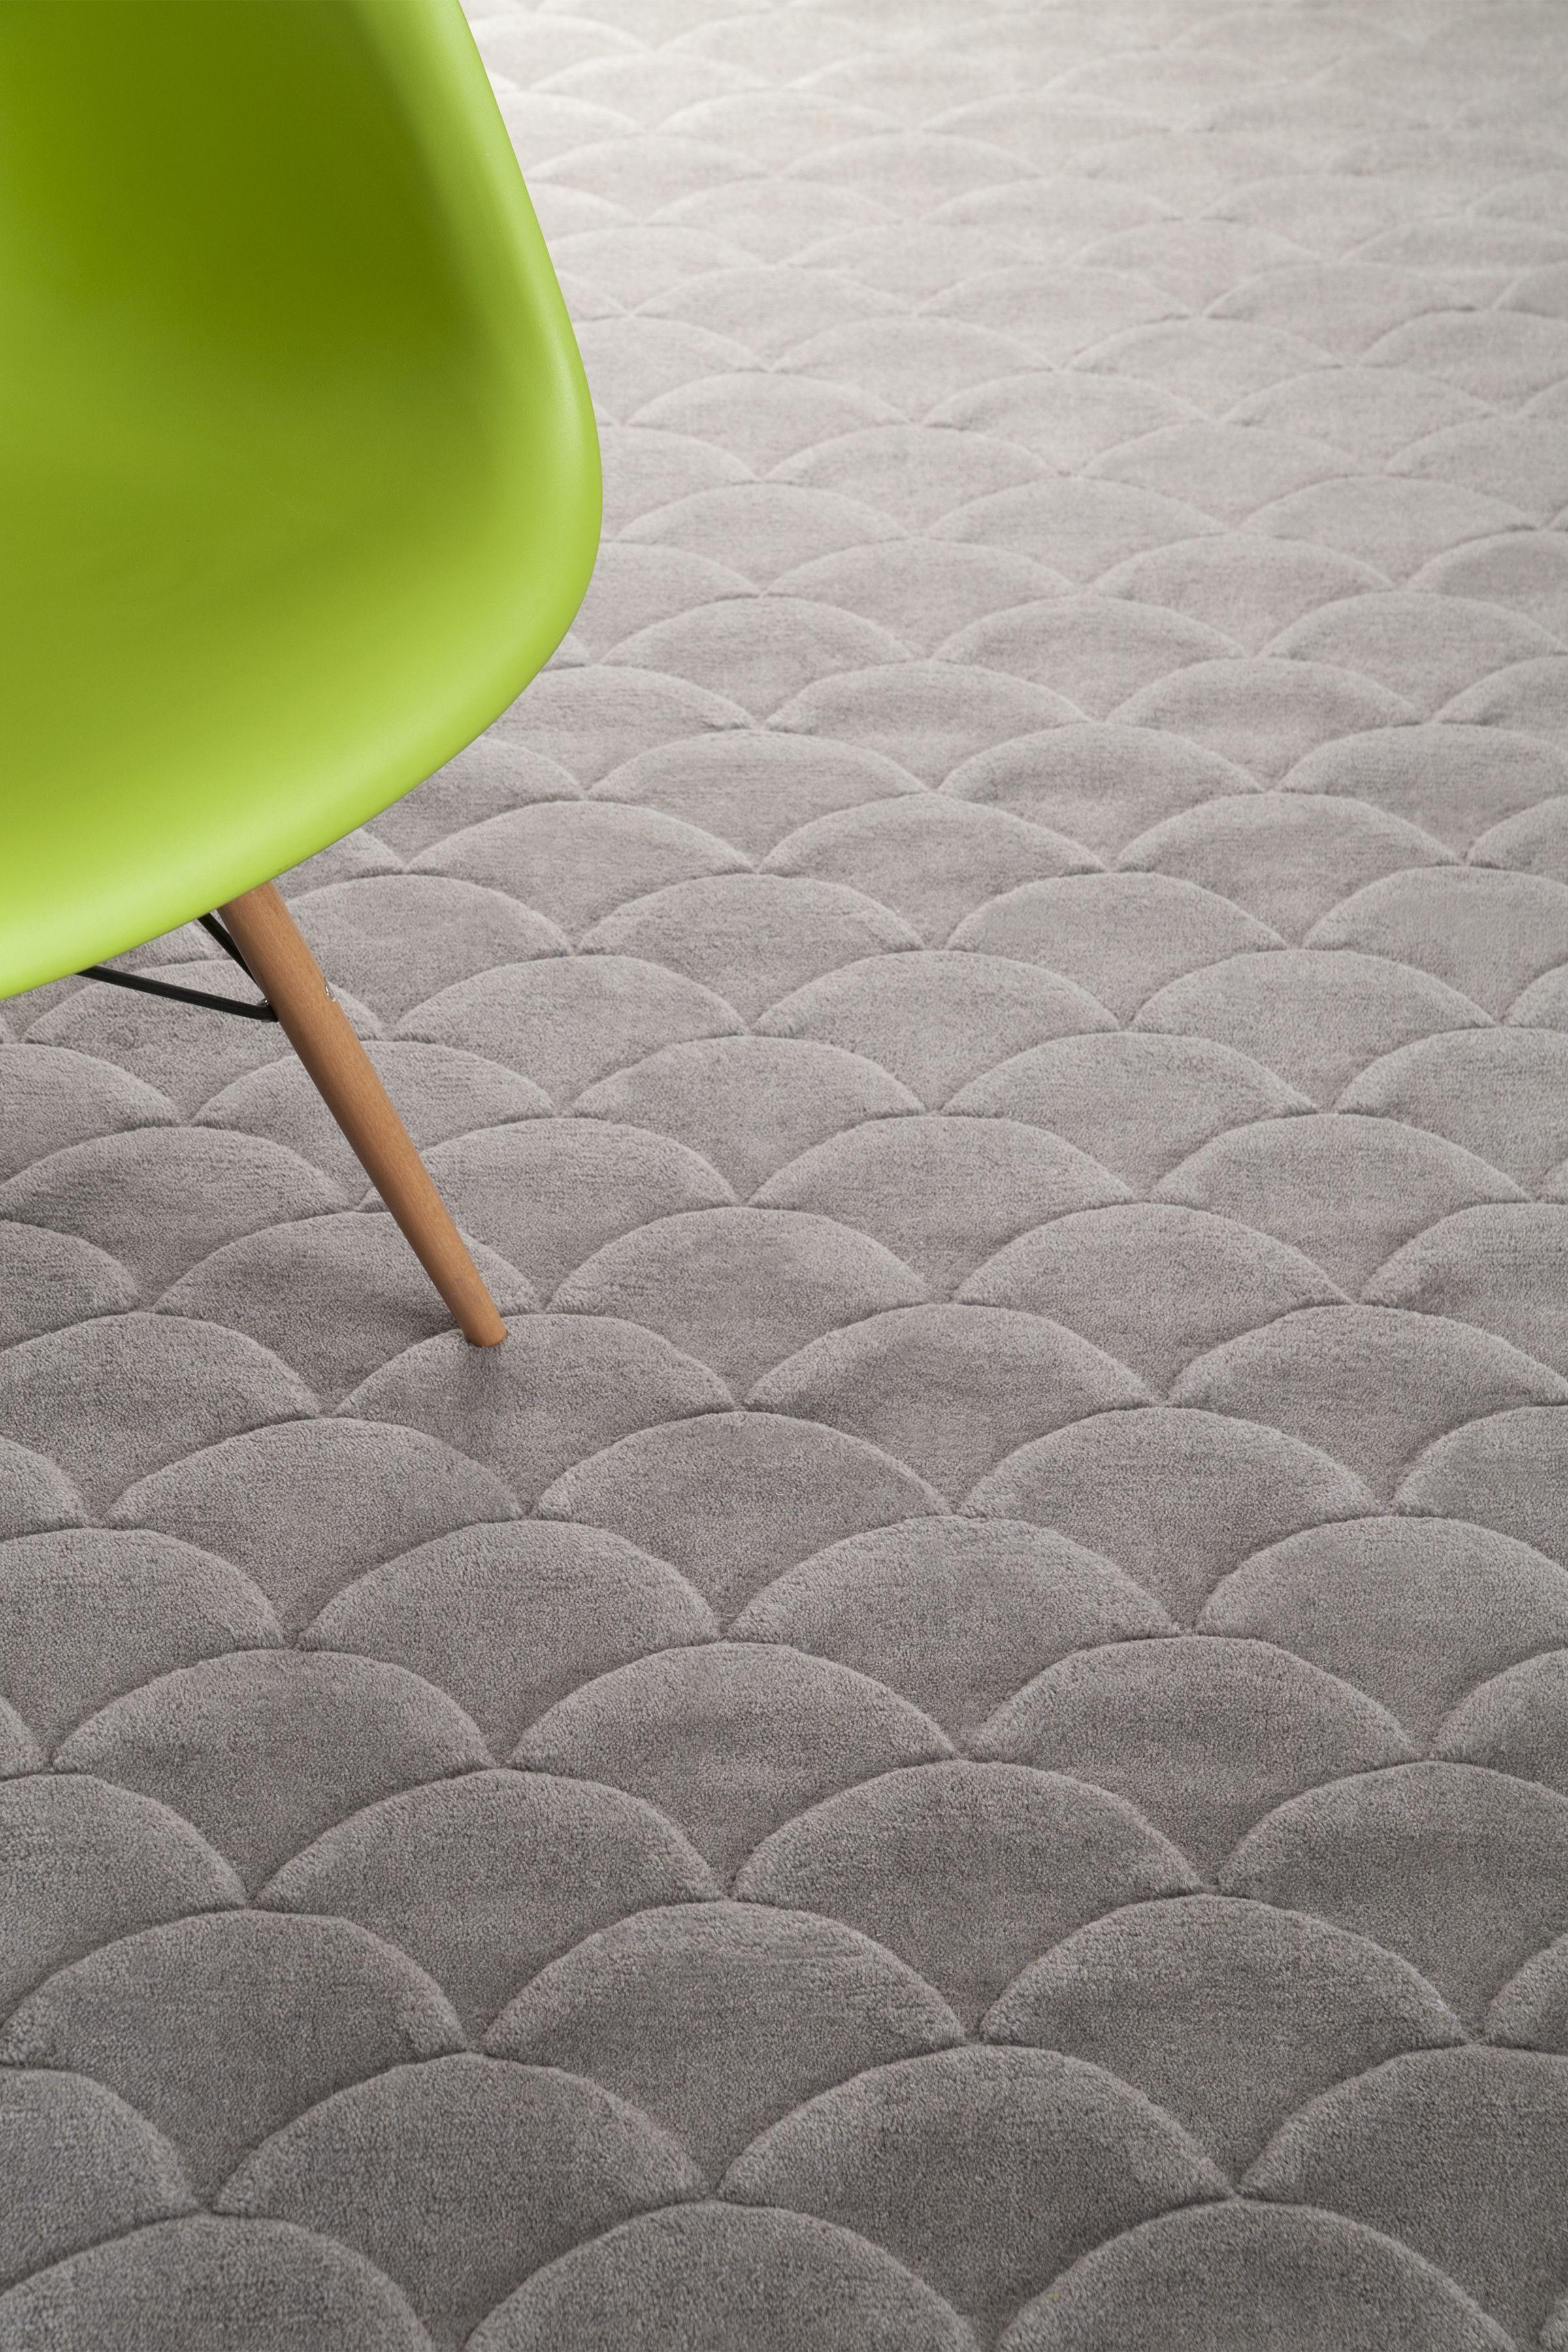 Surya's latest sculpted rugs are modern, fresh and so very soft! #inspiredbysurya Amazing Rug :)